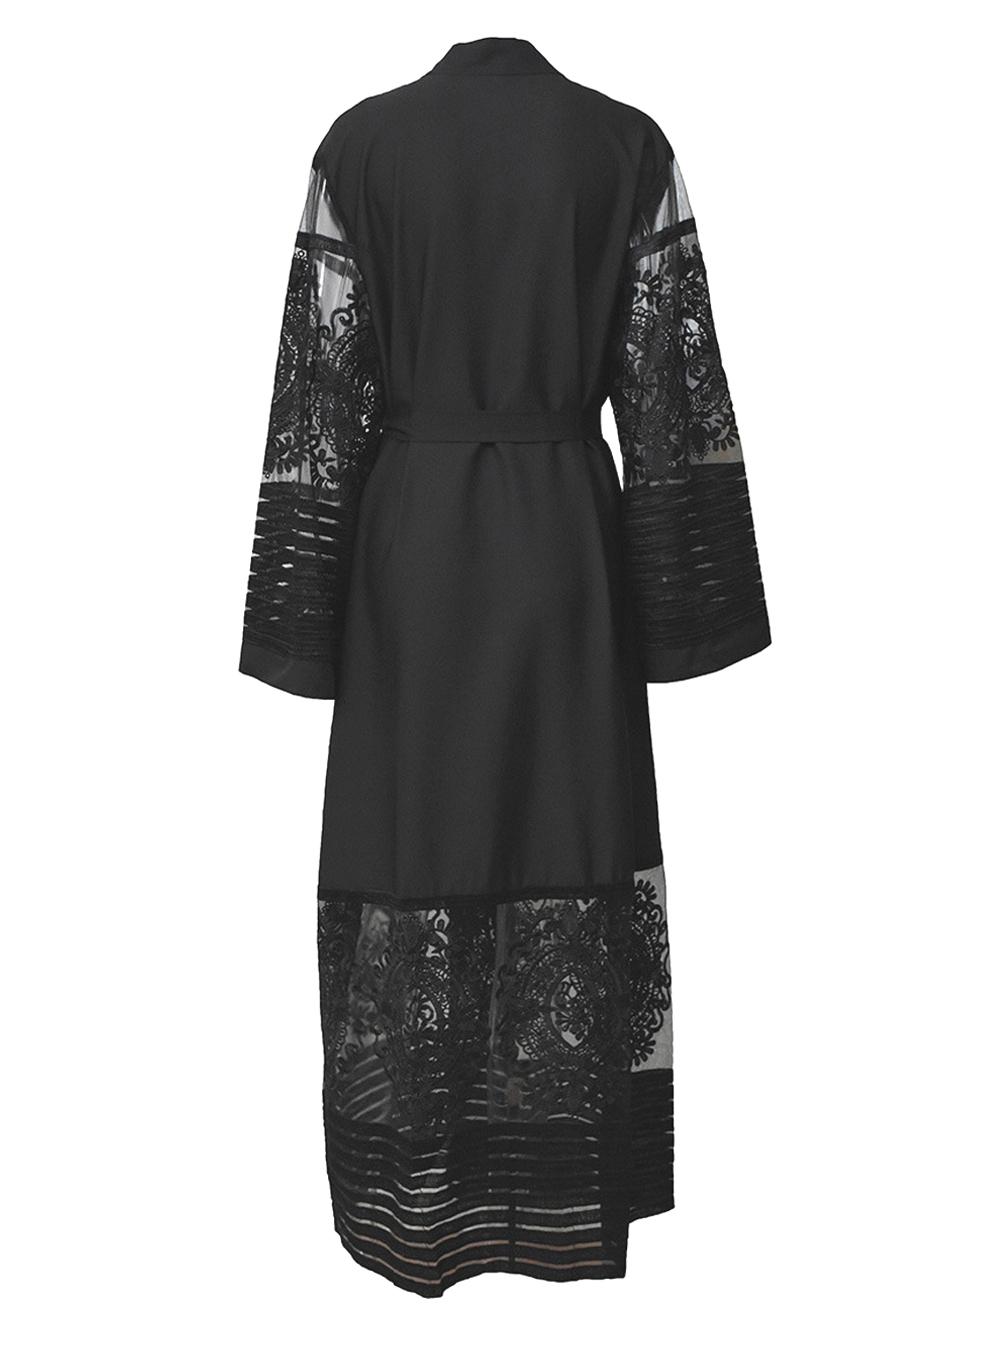 Women Embroidered Boho Long Sleeve Kimono Wrap Lace Maxi Dress Abaya -pld73